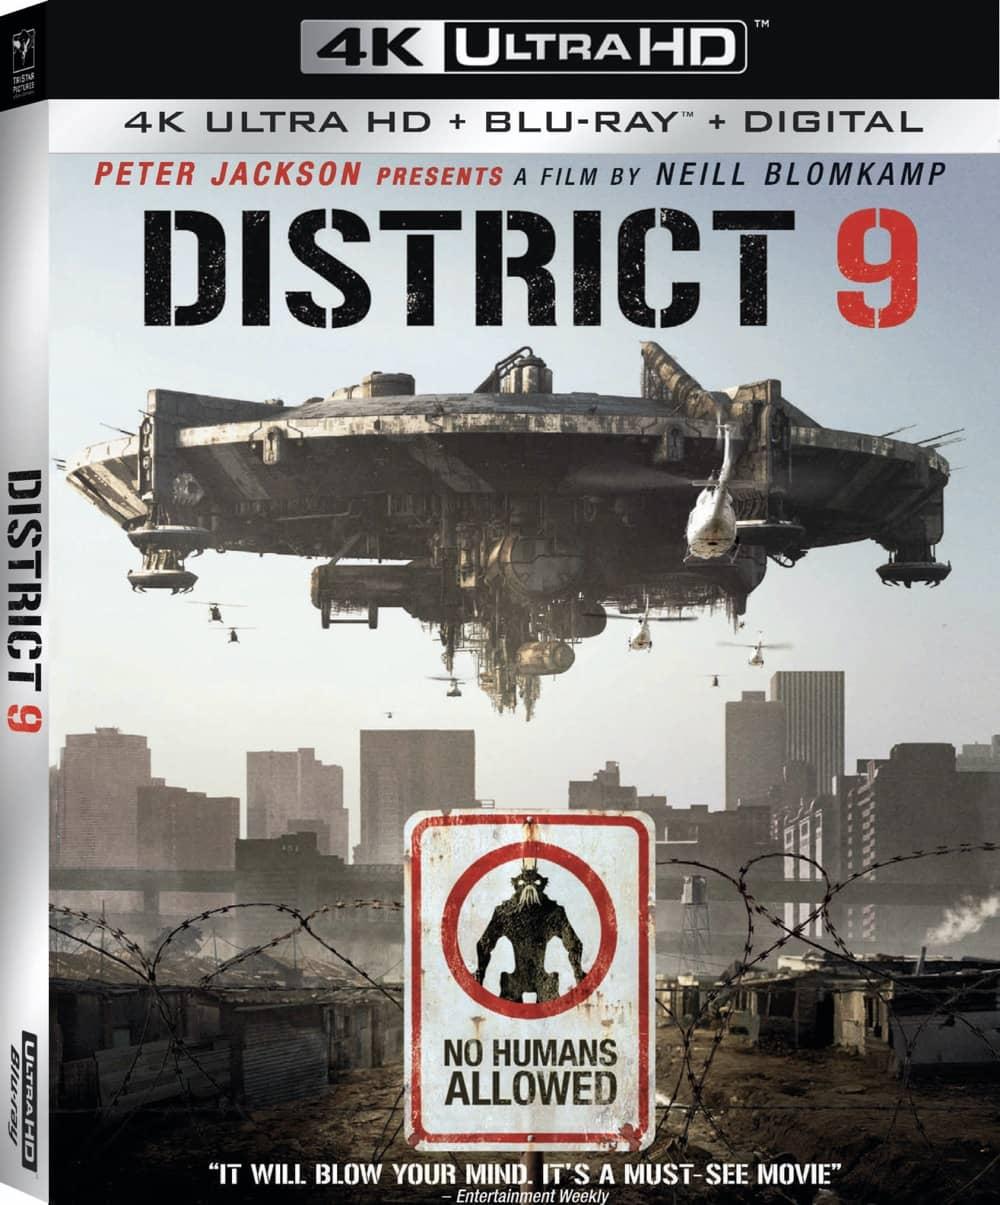 District 9 4K Cover Artwork